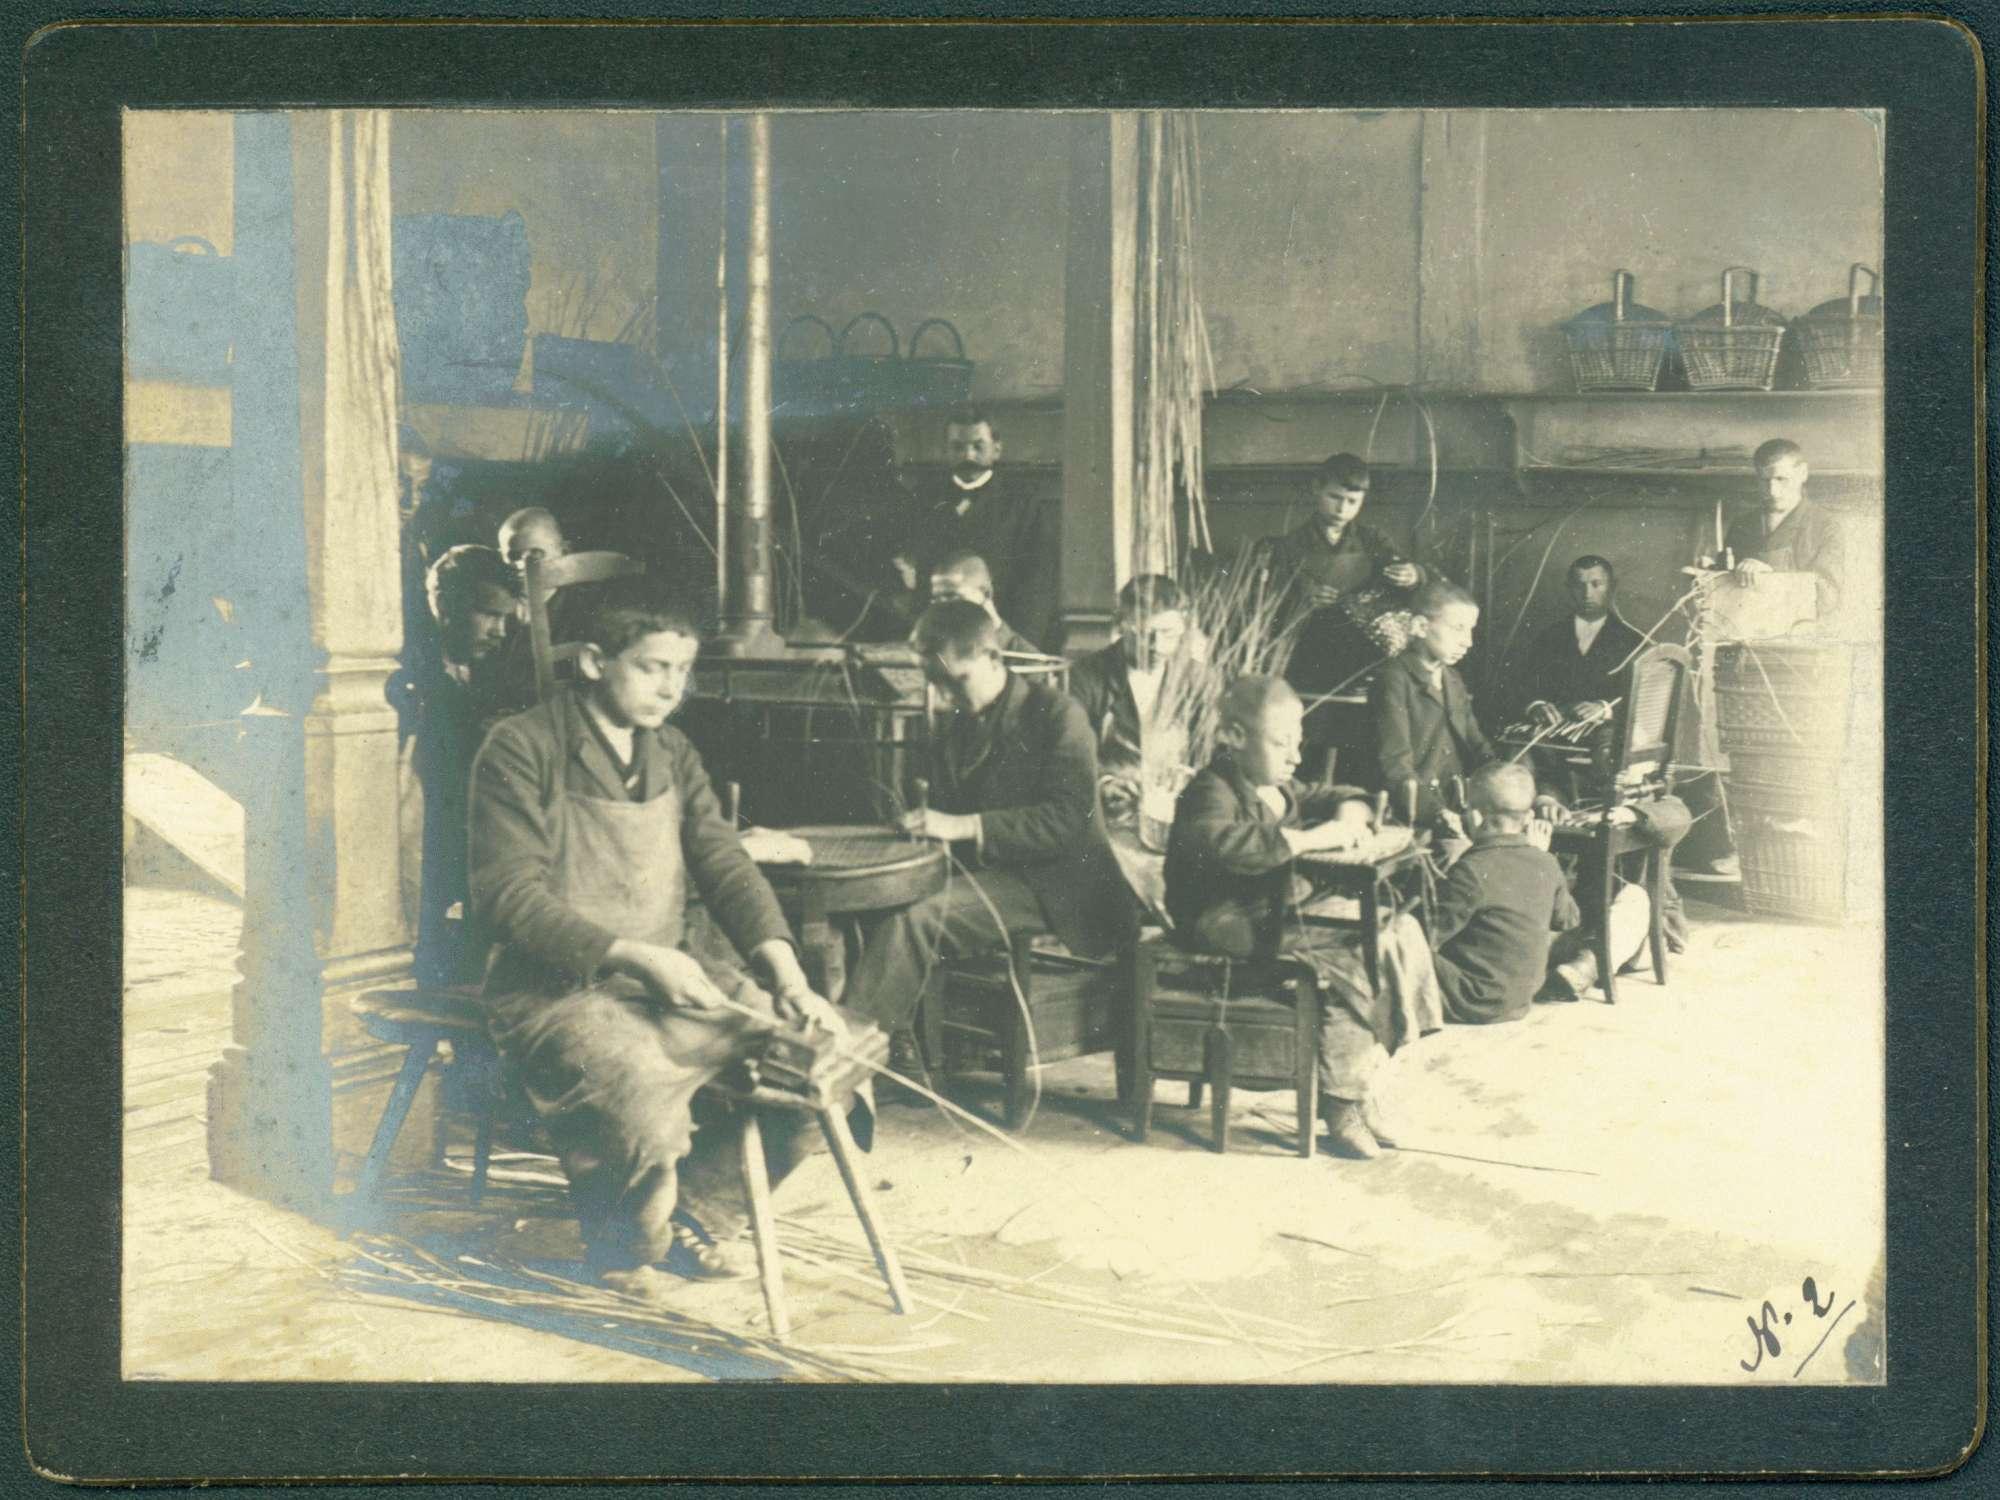 Arbeitsraum, Knaben bei Korbflechtarbeiten., Bild 1